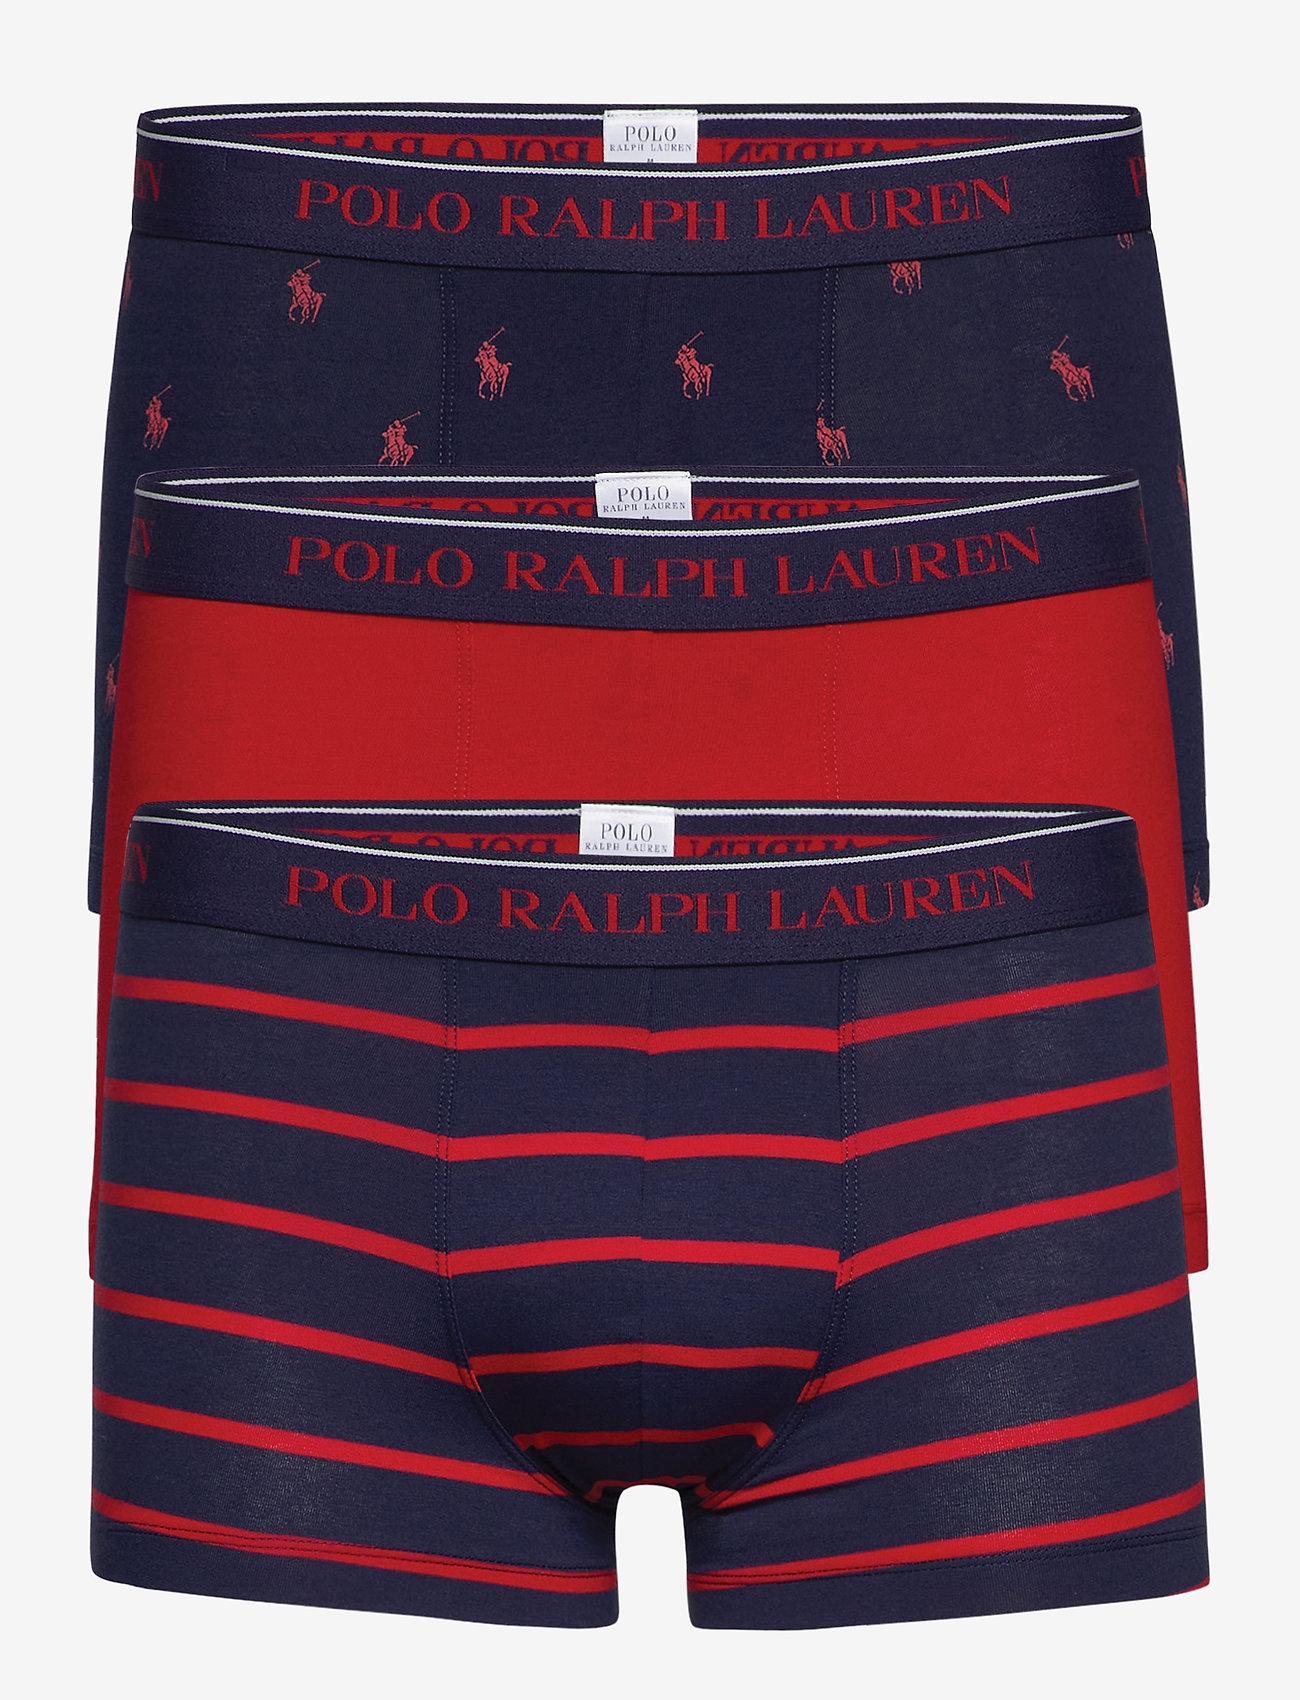 Polo Ralph Lauren Underwear - Stretch-Cotton Trunk 3-Pack - boxershorts - 3pk nvy aopp/nvy - 0